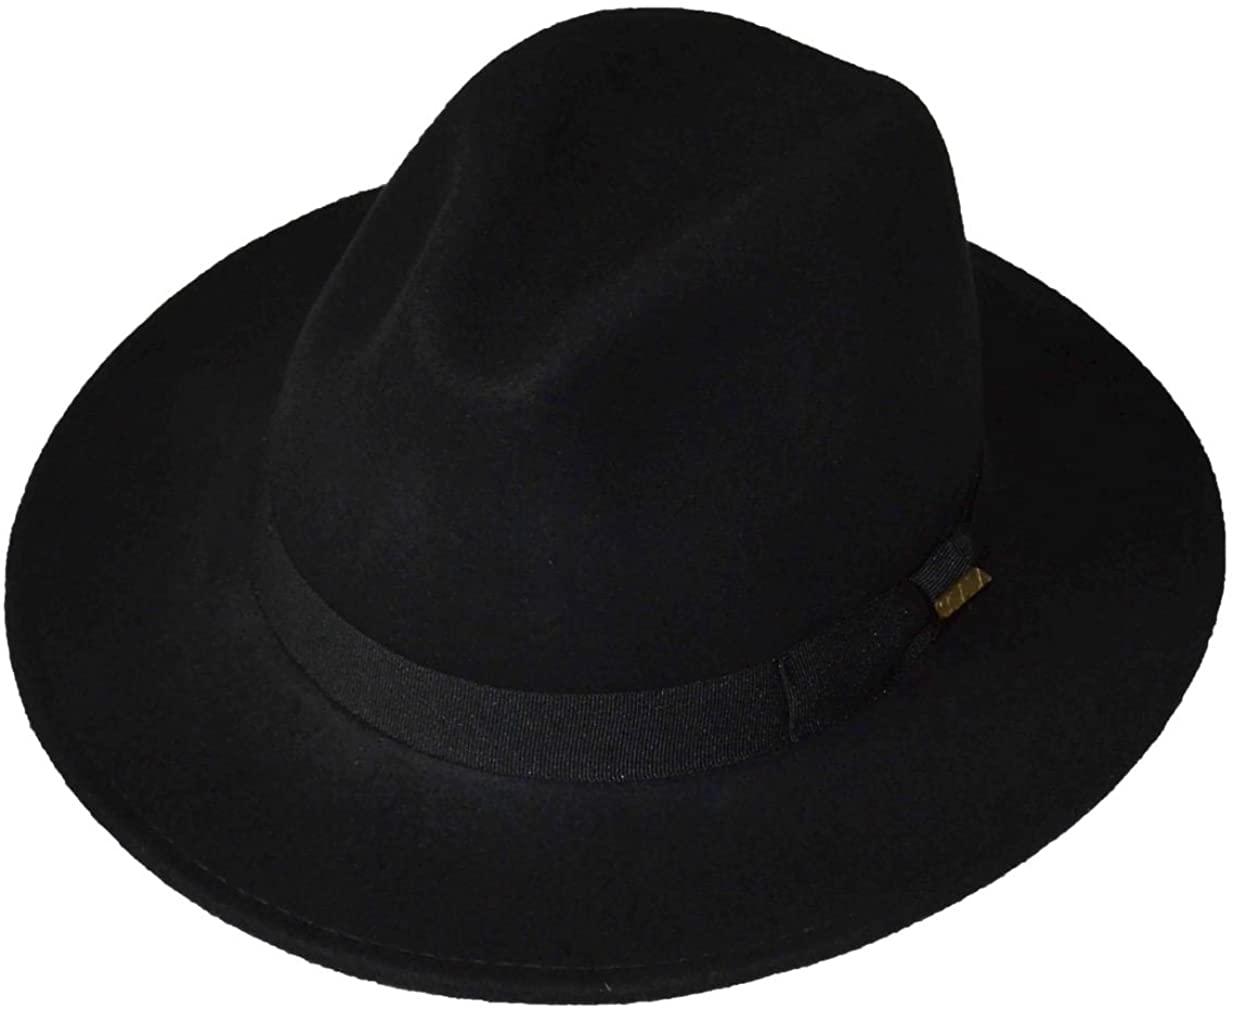 Scala Mens Safaris Shape 100% Wool Felt Fedora Black